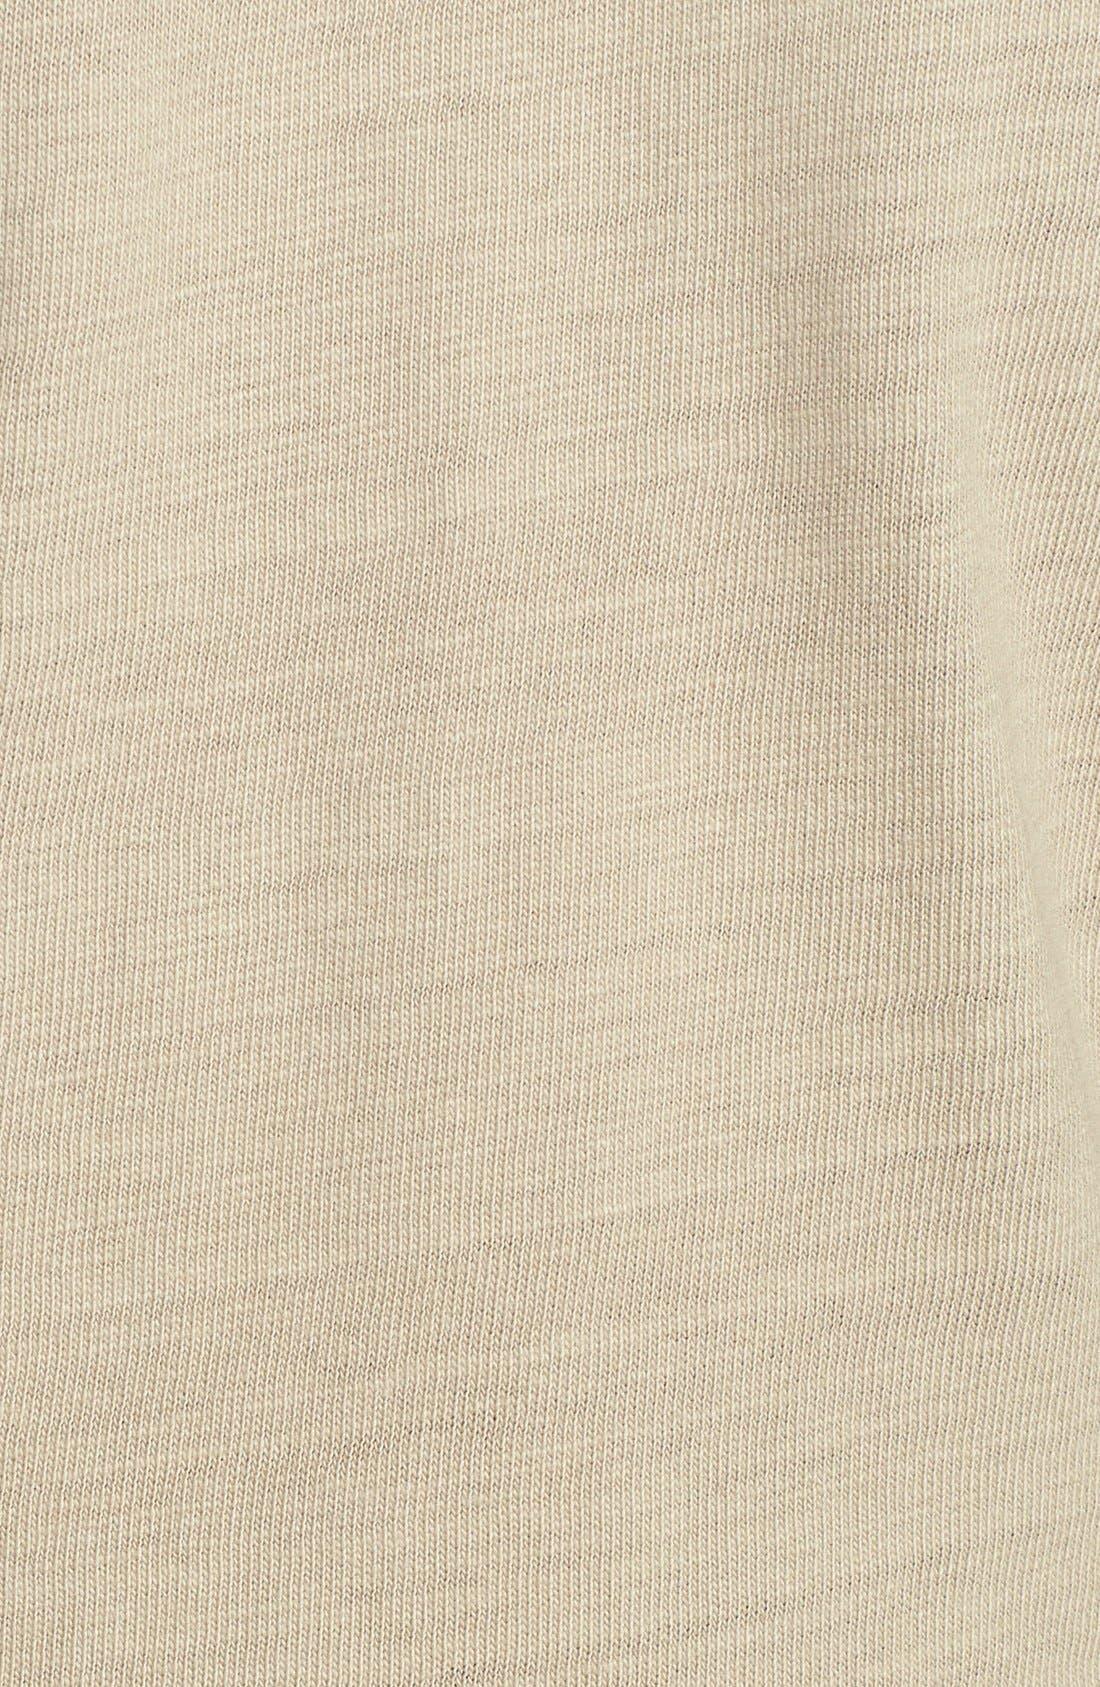 Alternate Image 3  - Caslon® Knit One-Button Blazer (Petite)